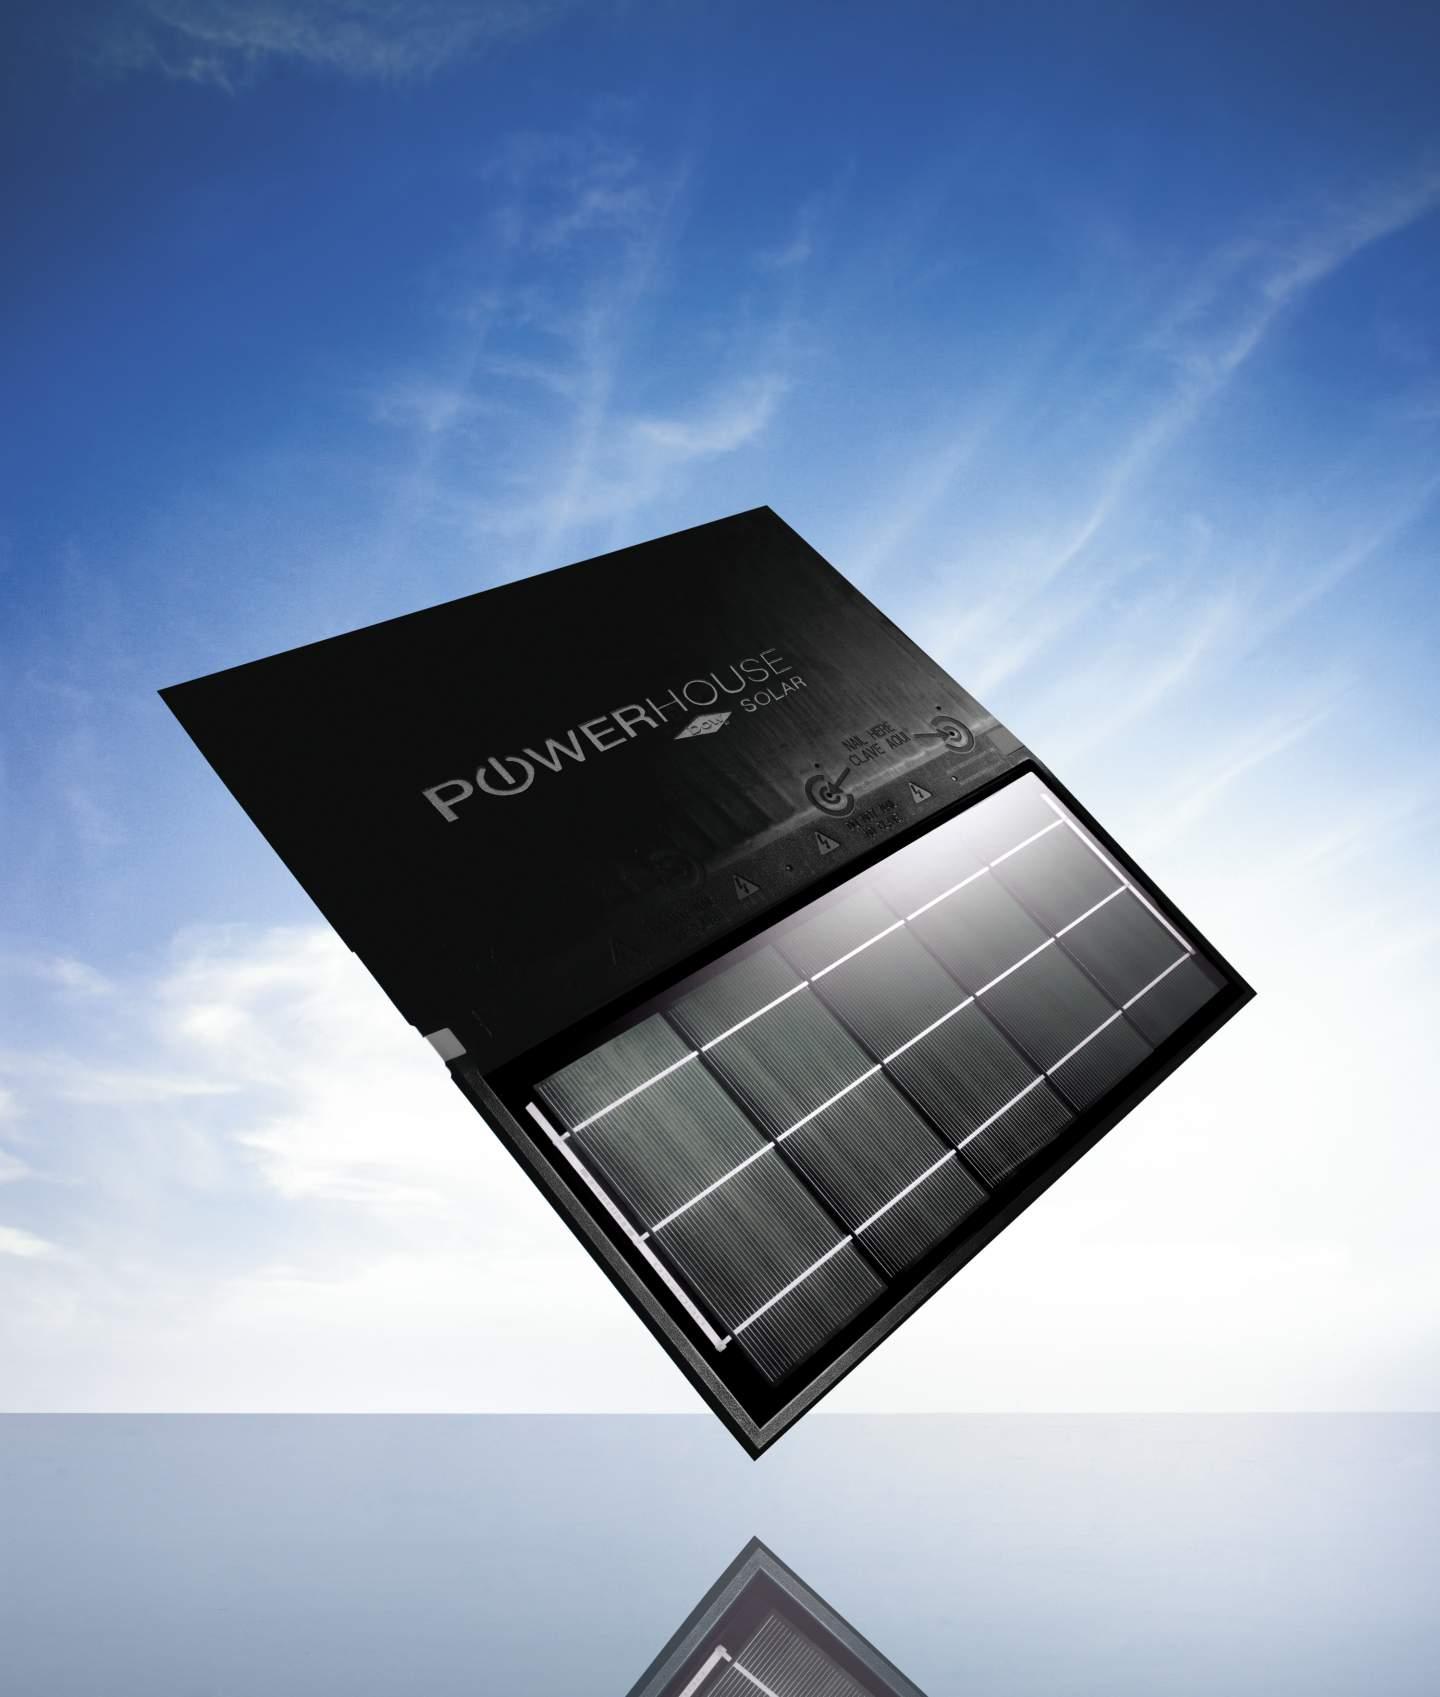 Molex 由于对突破性的陶氏POWERHOUSE,太阳能屋顶面板的突出贡献而荣获芝加哥创新奖